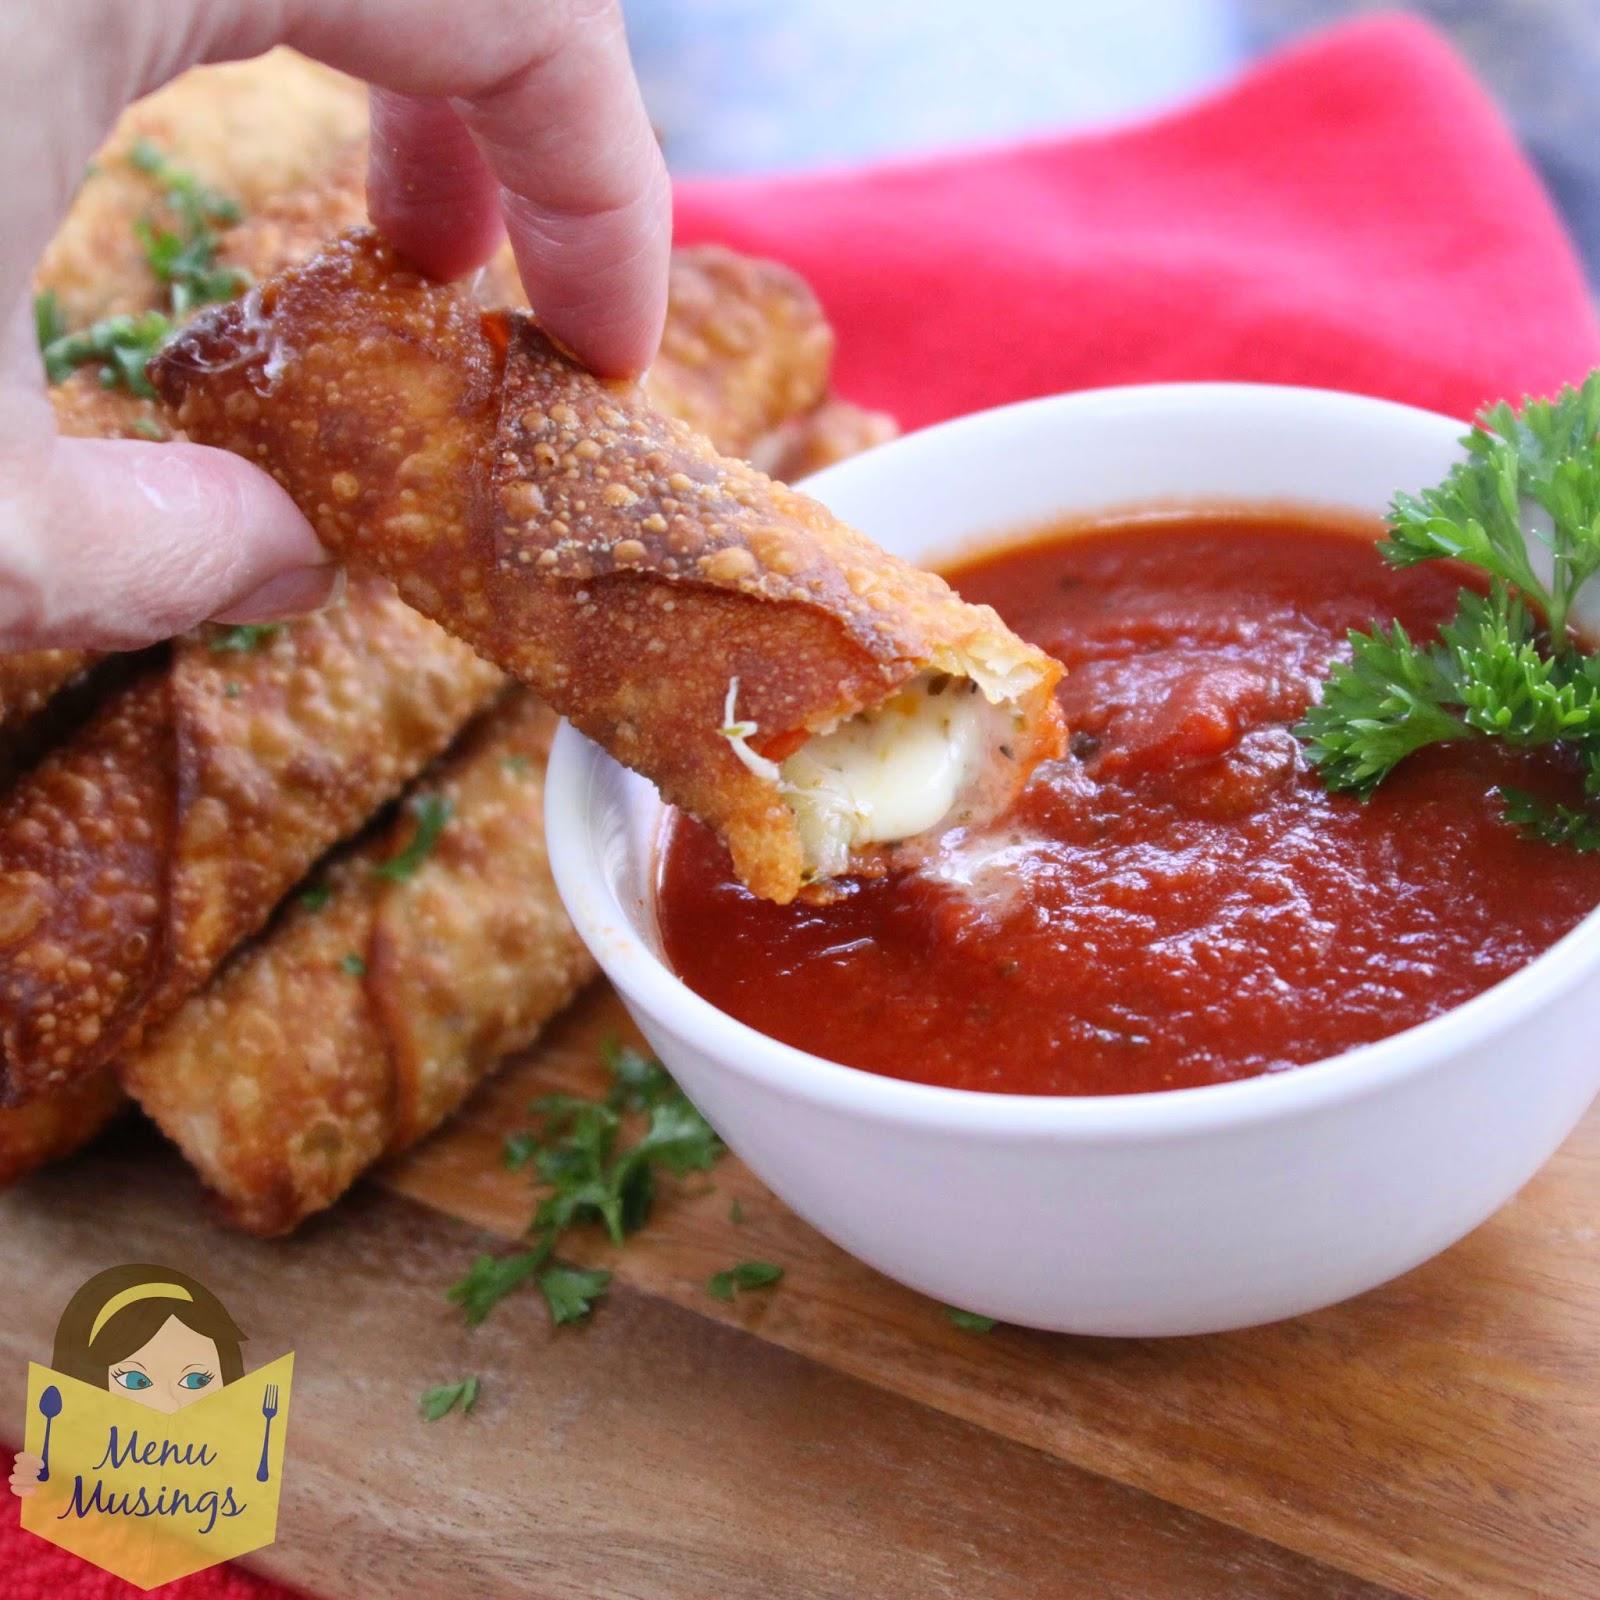 Happy Hour Pizza Rolls @ menumusings.com